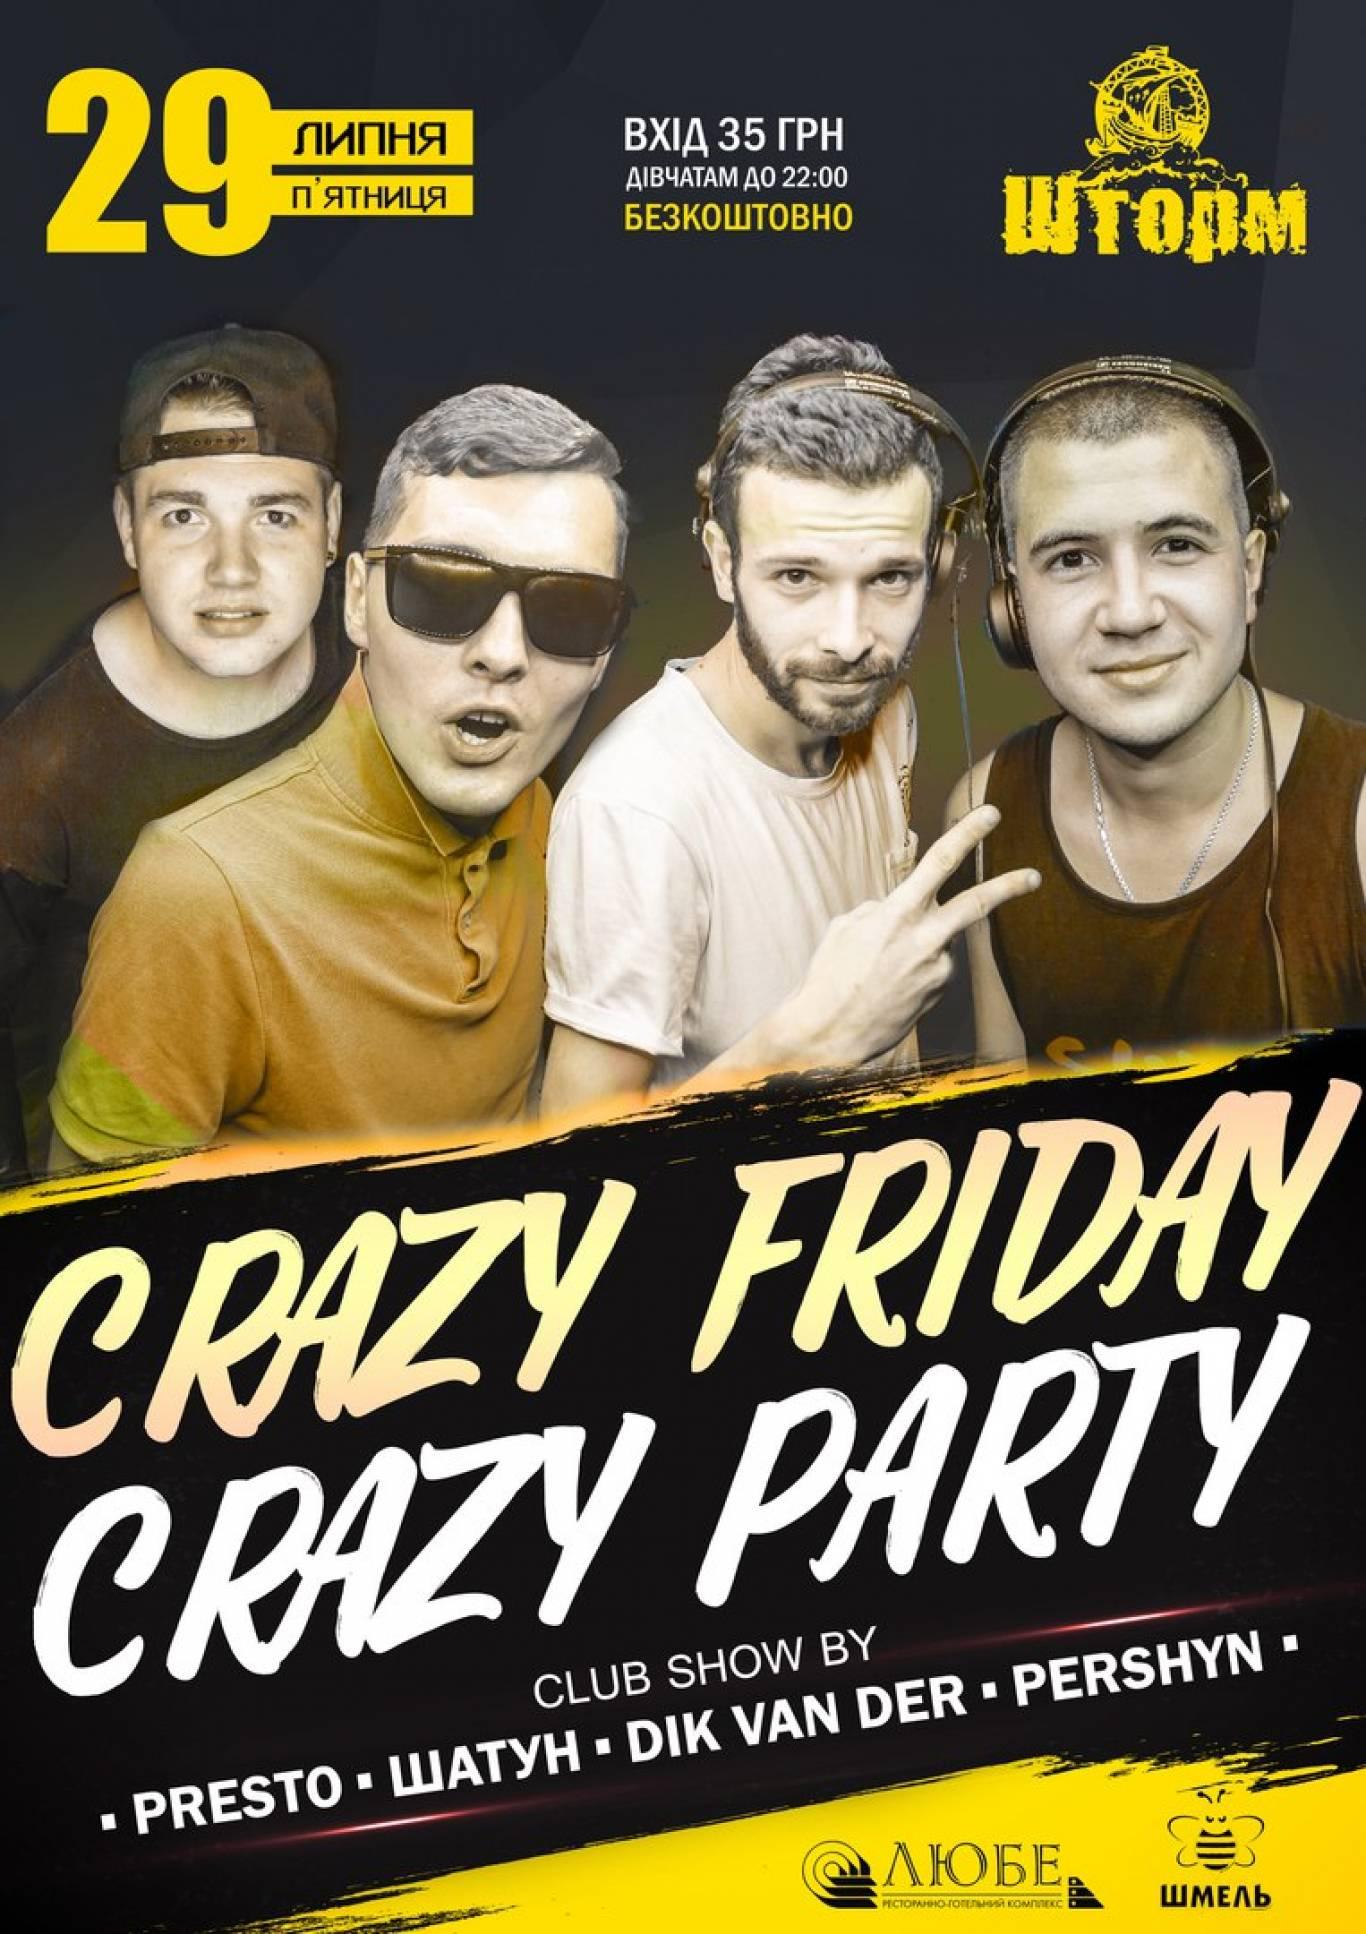 Вечірка Crazy friday party